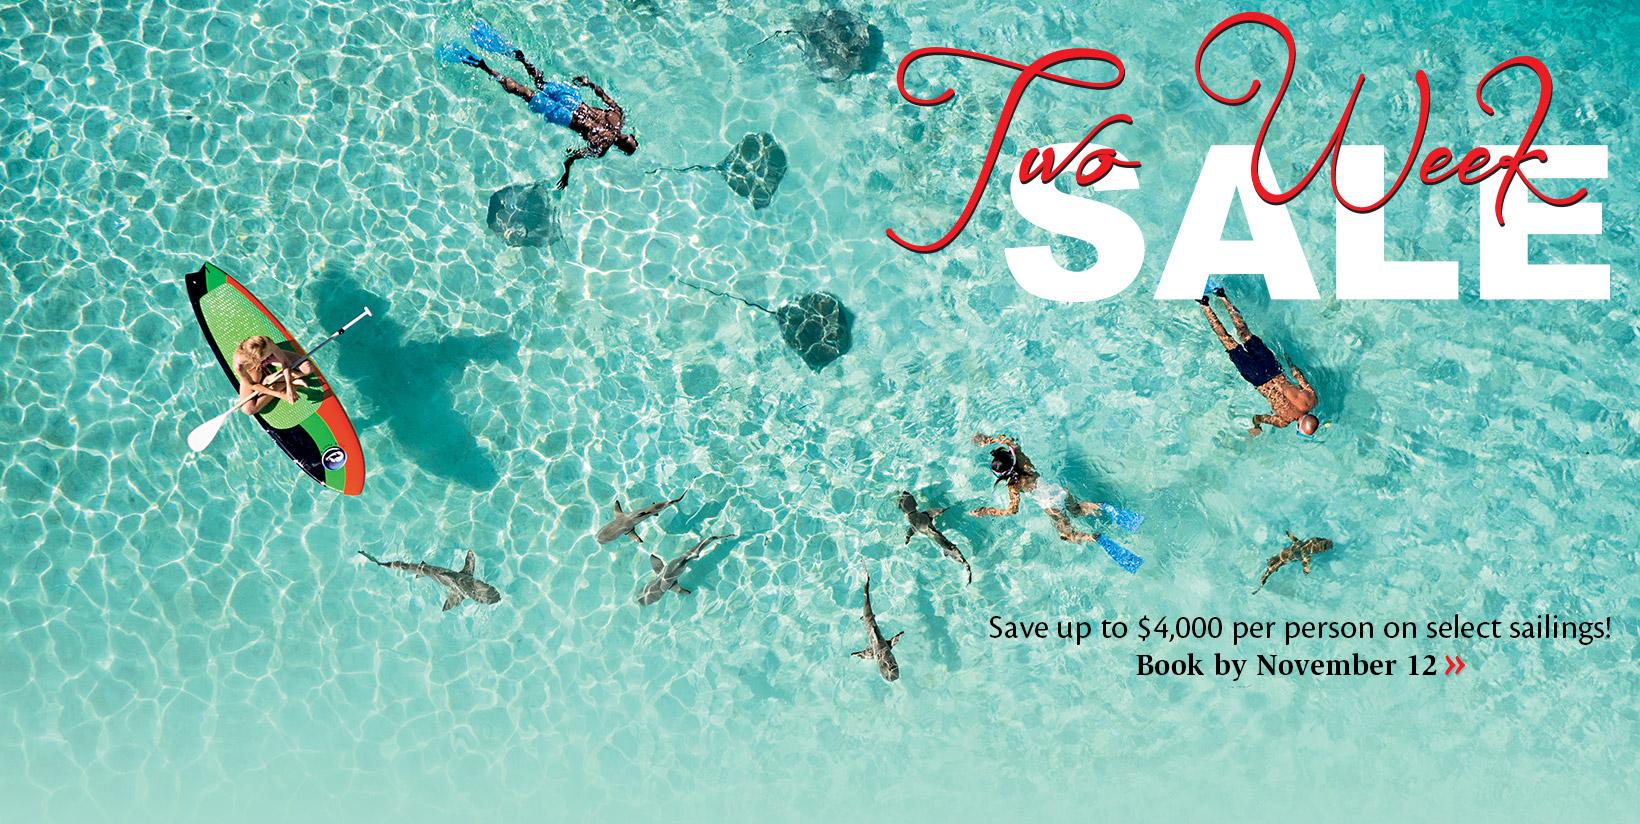 10122_2week_sale_hmpg-slider_1640x824